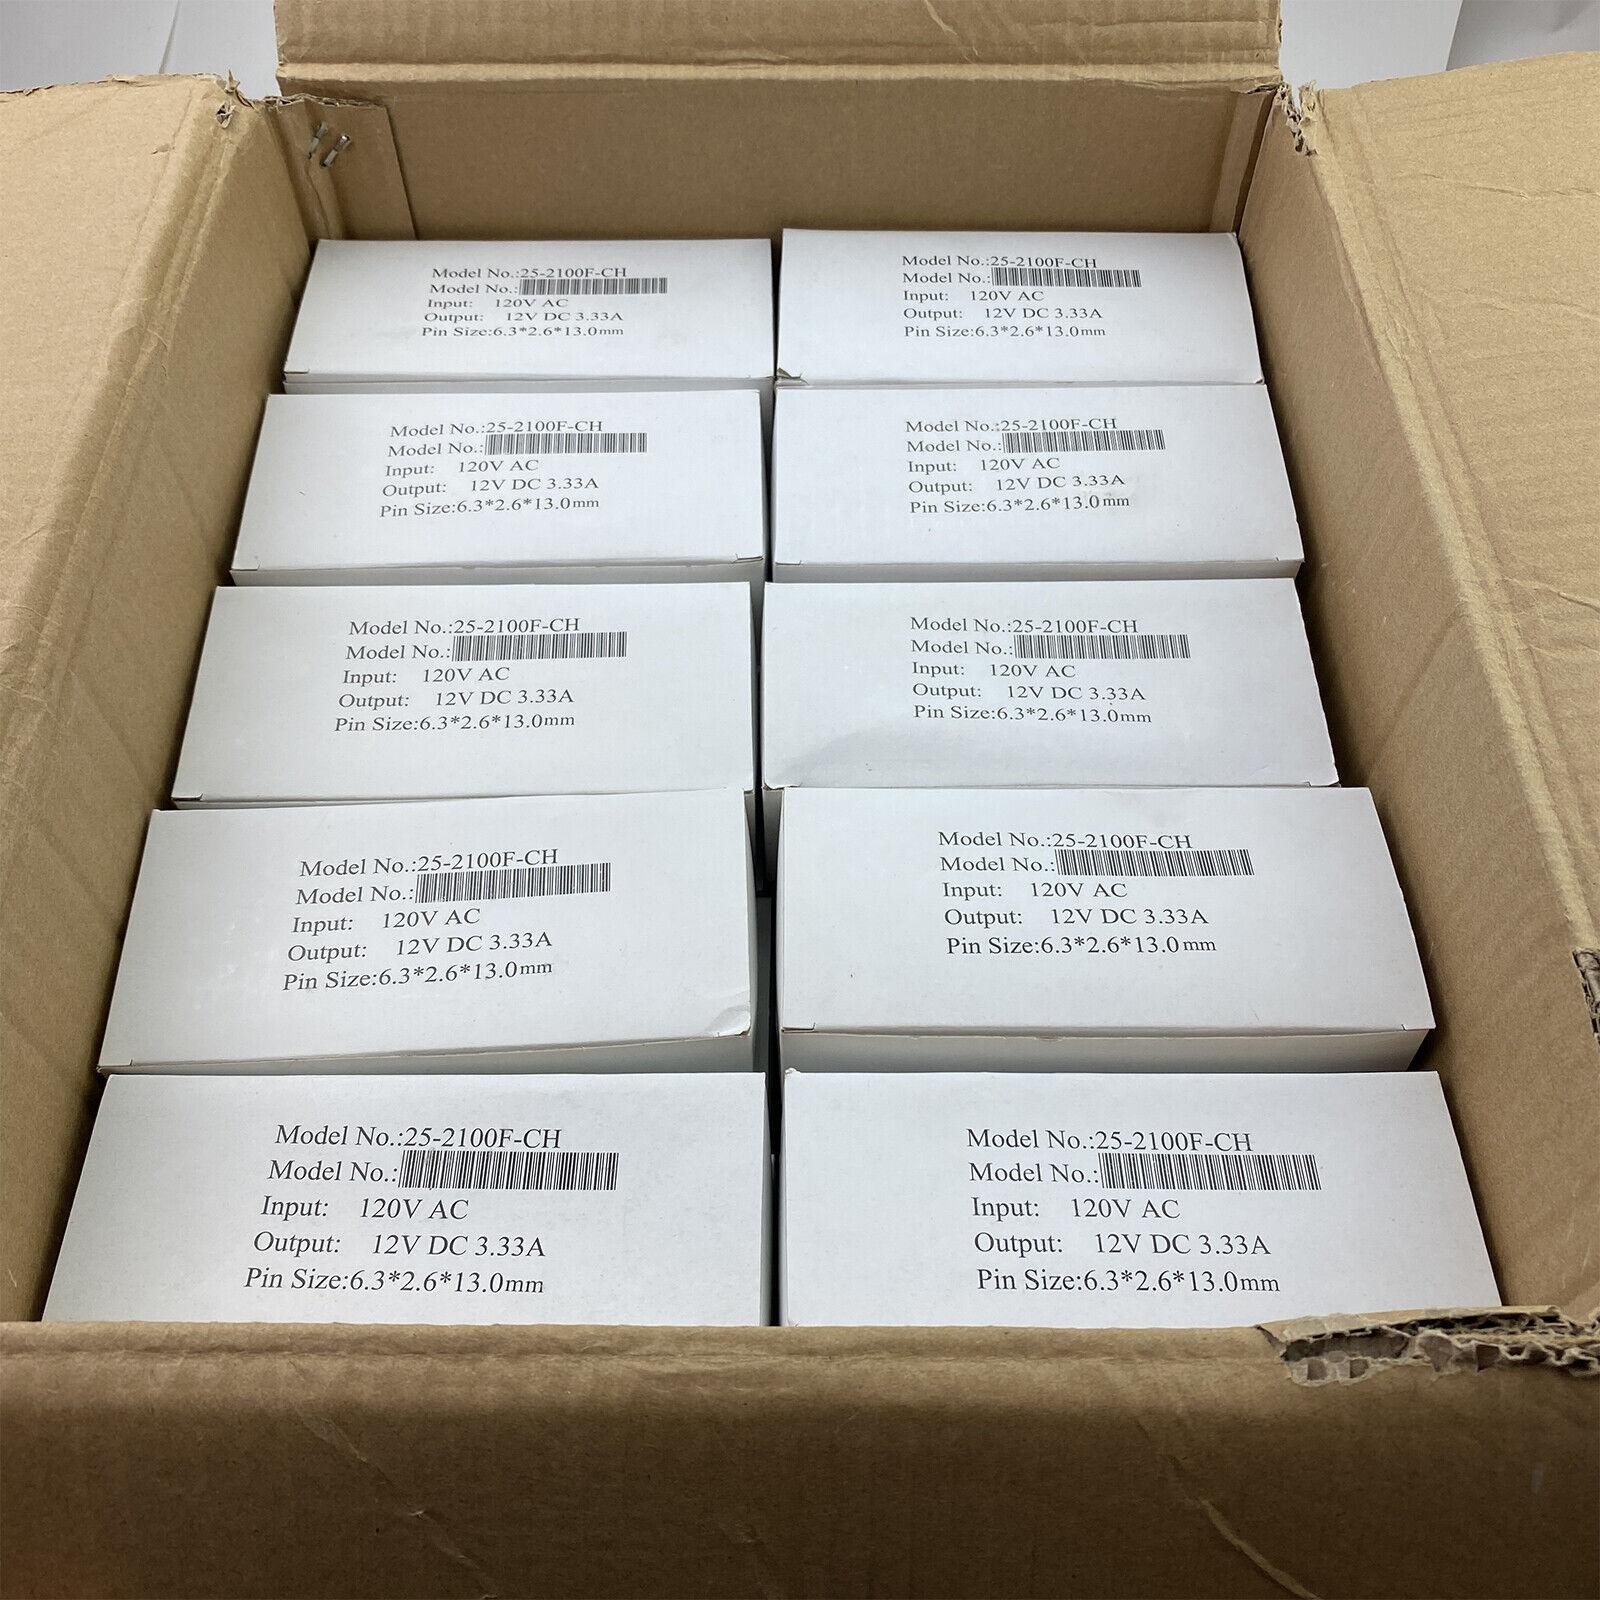 Lot of (50) - NEW 40W AC Adapter 12V 3.33A G40DD-120333-A 6.3x2.6x13.0mm